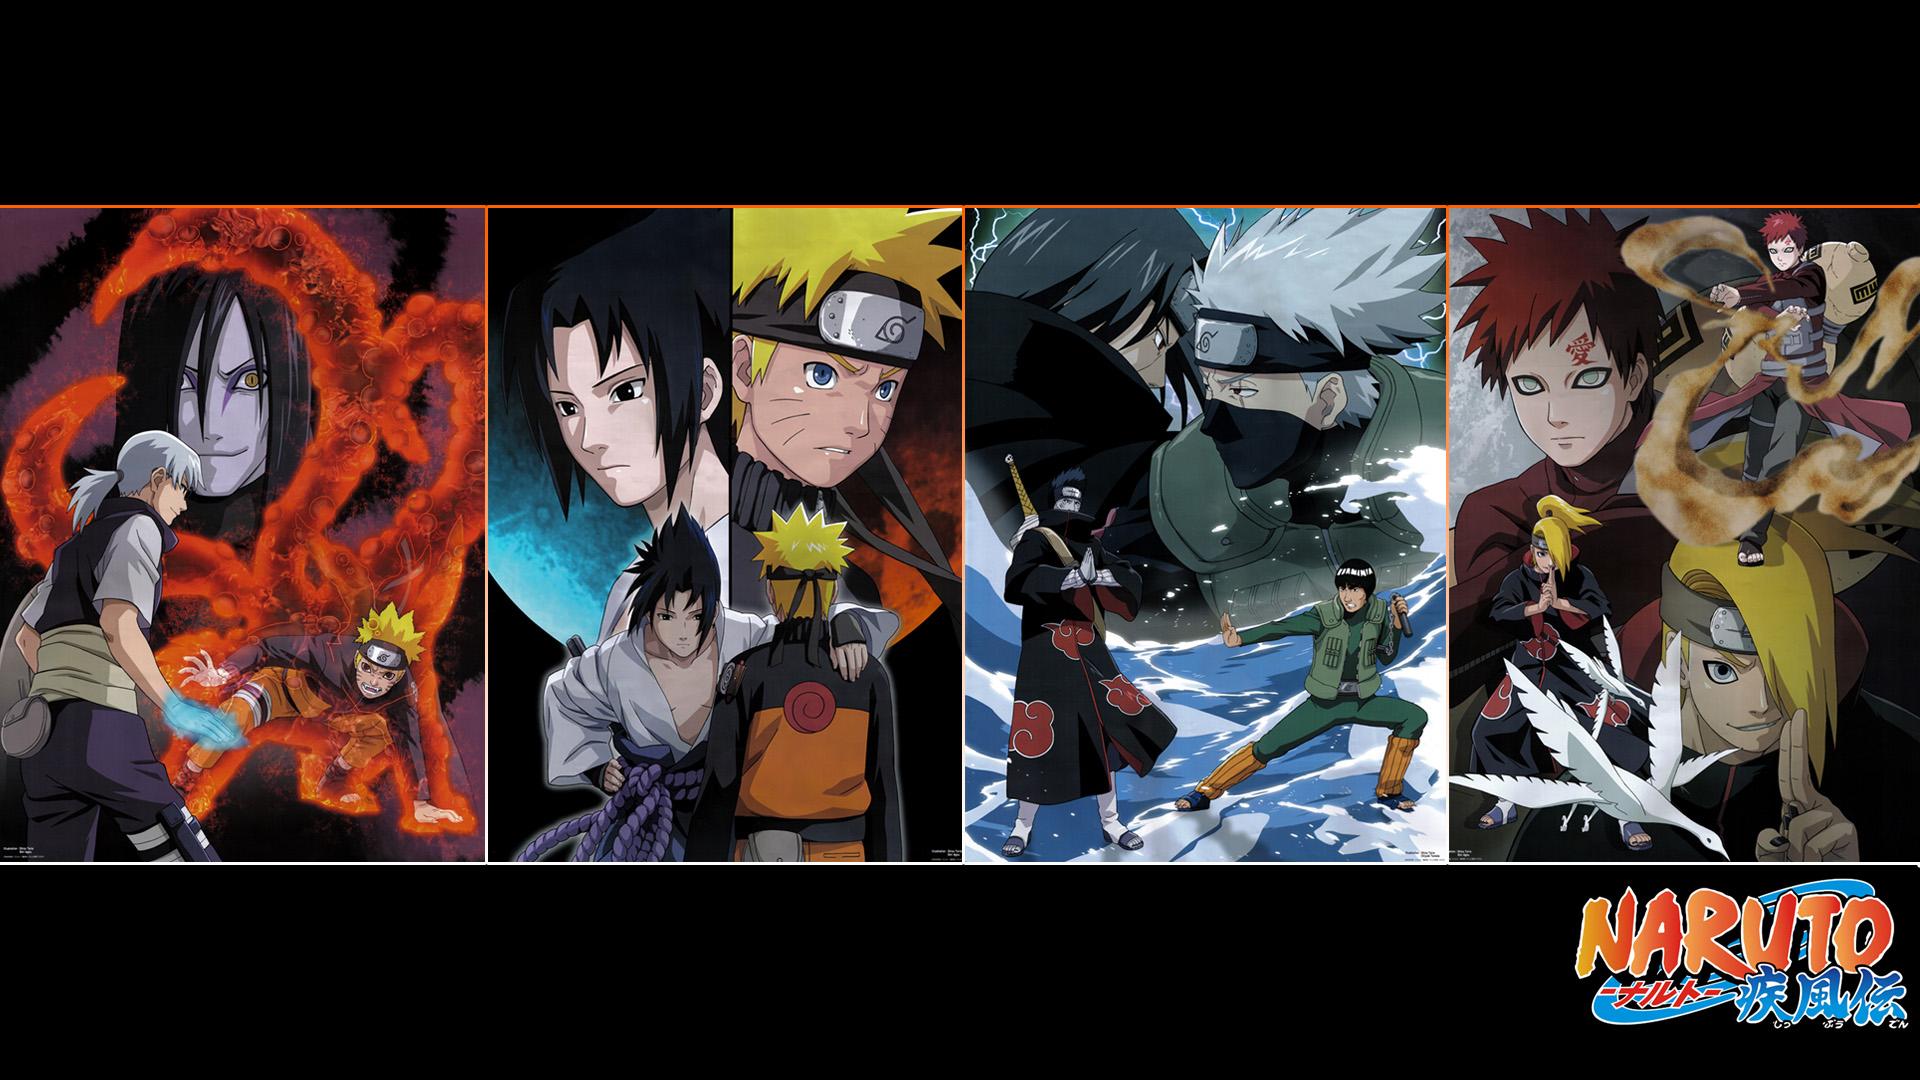 Naruto Teams Shippuden Anime wallpapers HD   180304 1920x1080